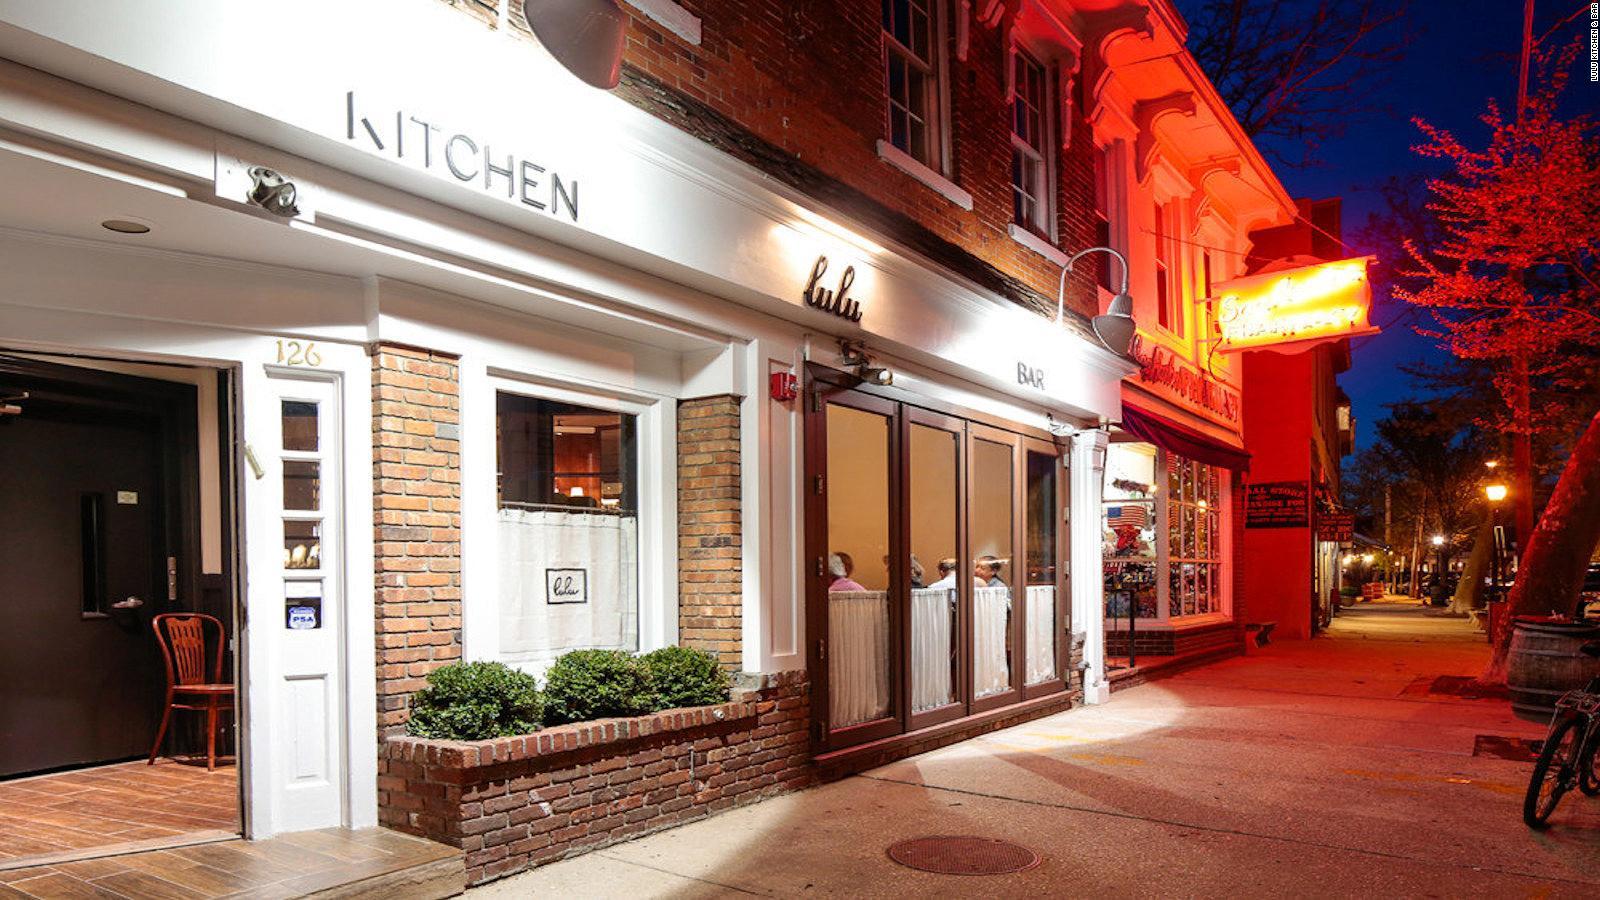 the hamptons best restaurants according to lti cnn travel - Lulus Kitchen